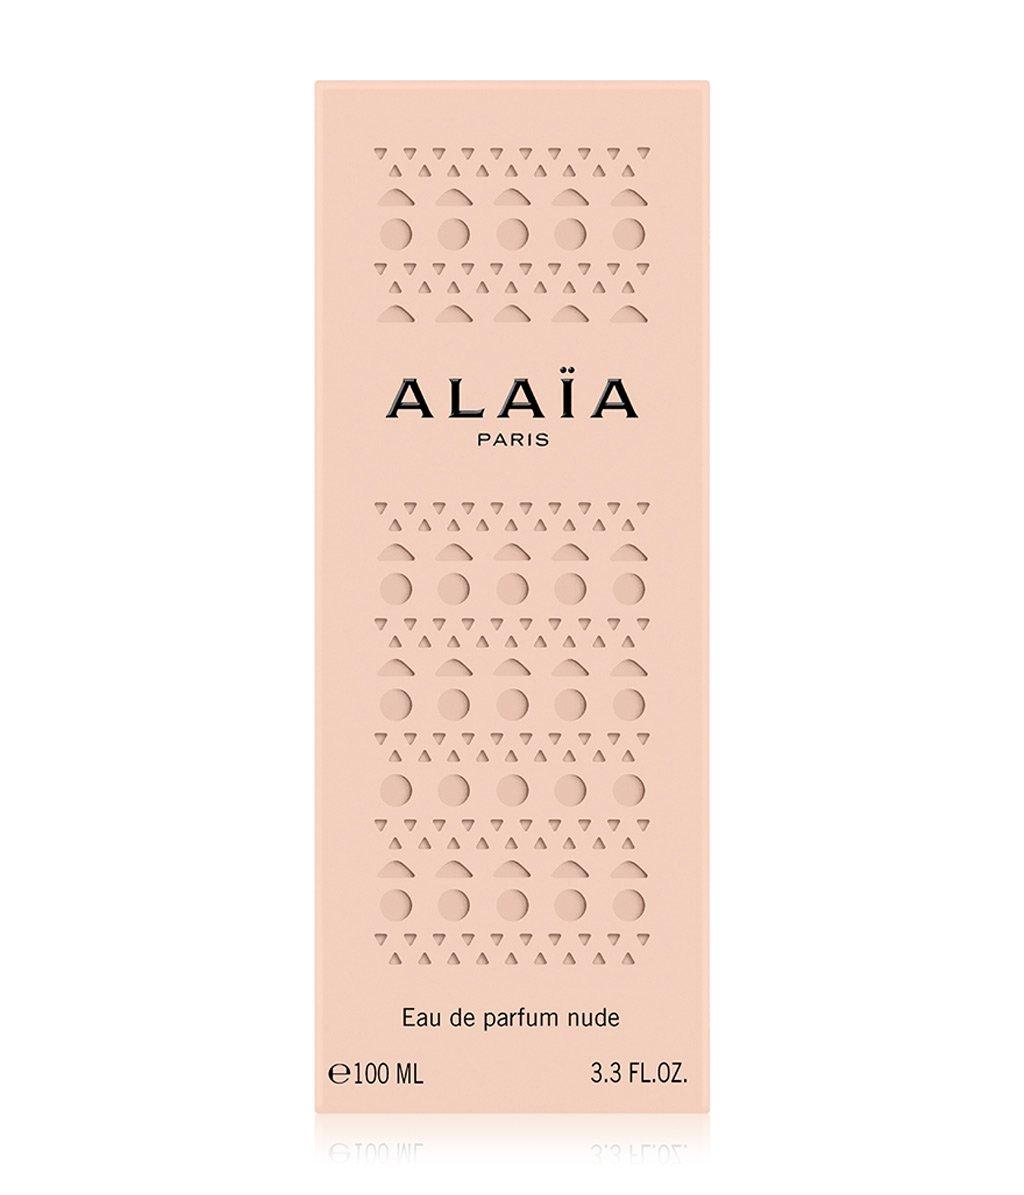 ala a nude alaia paris parfum ein neues parfum f r frauen 2017. Black Bedroom Furniture Sets. Home Design Ideas